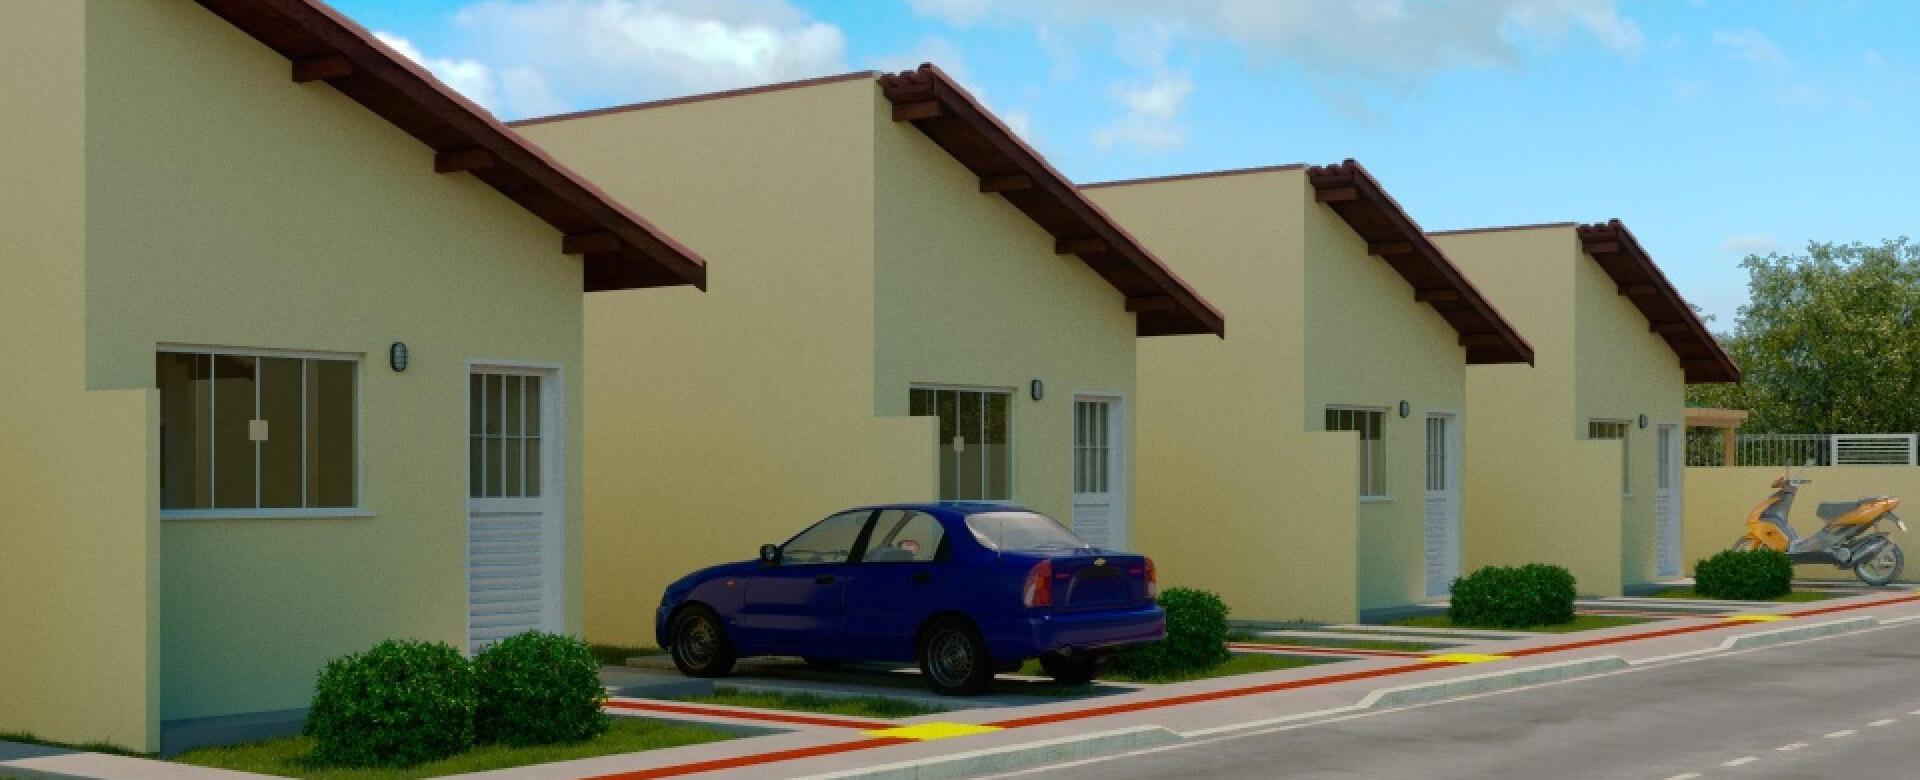 Residencial Ibiporã, foto 1